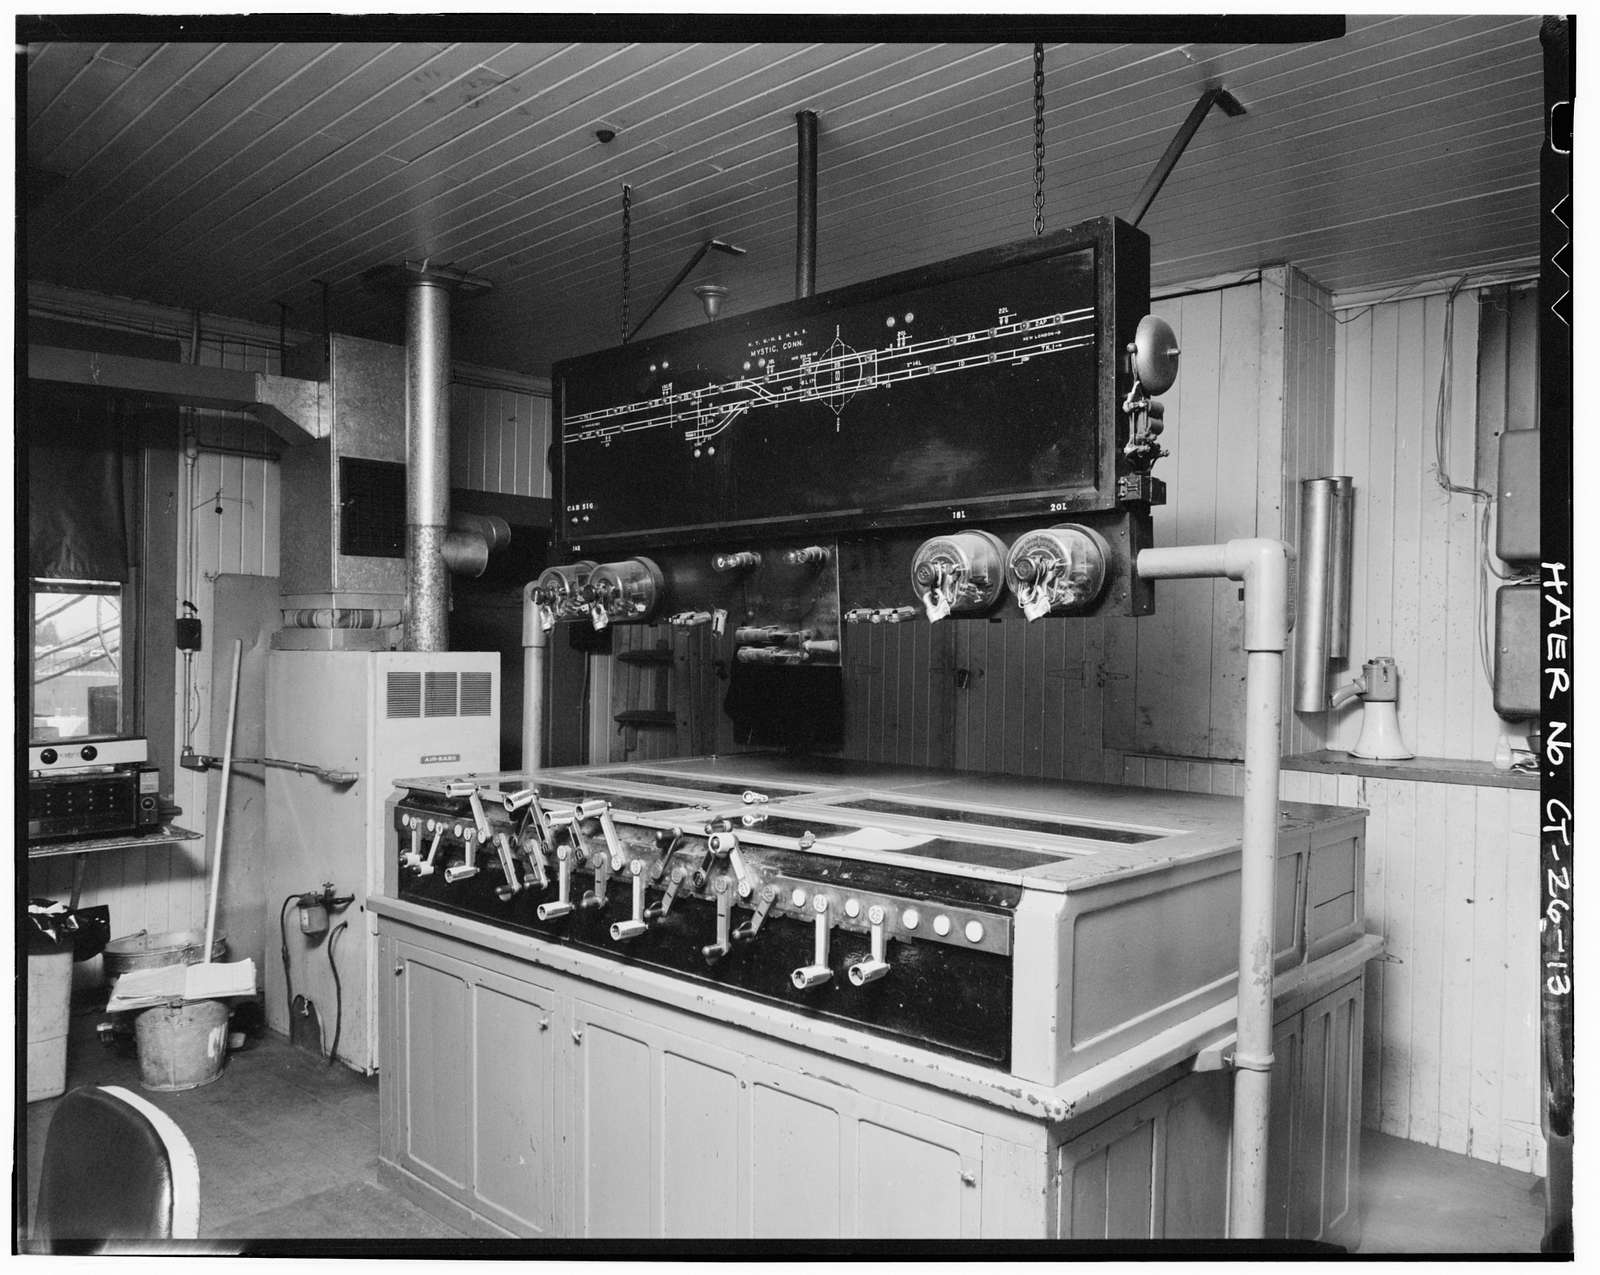 New York, New Haven & Hartford Railroad, Mystic River Bridge, Spanning Mystic River between Groton & Stonington, Groton, New London County, CT